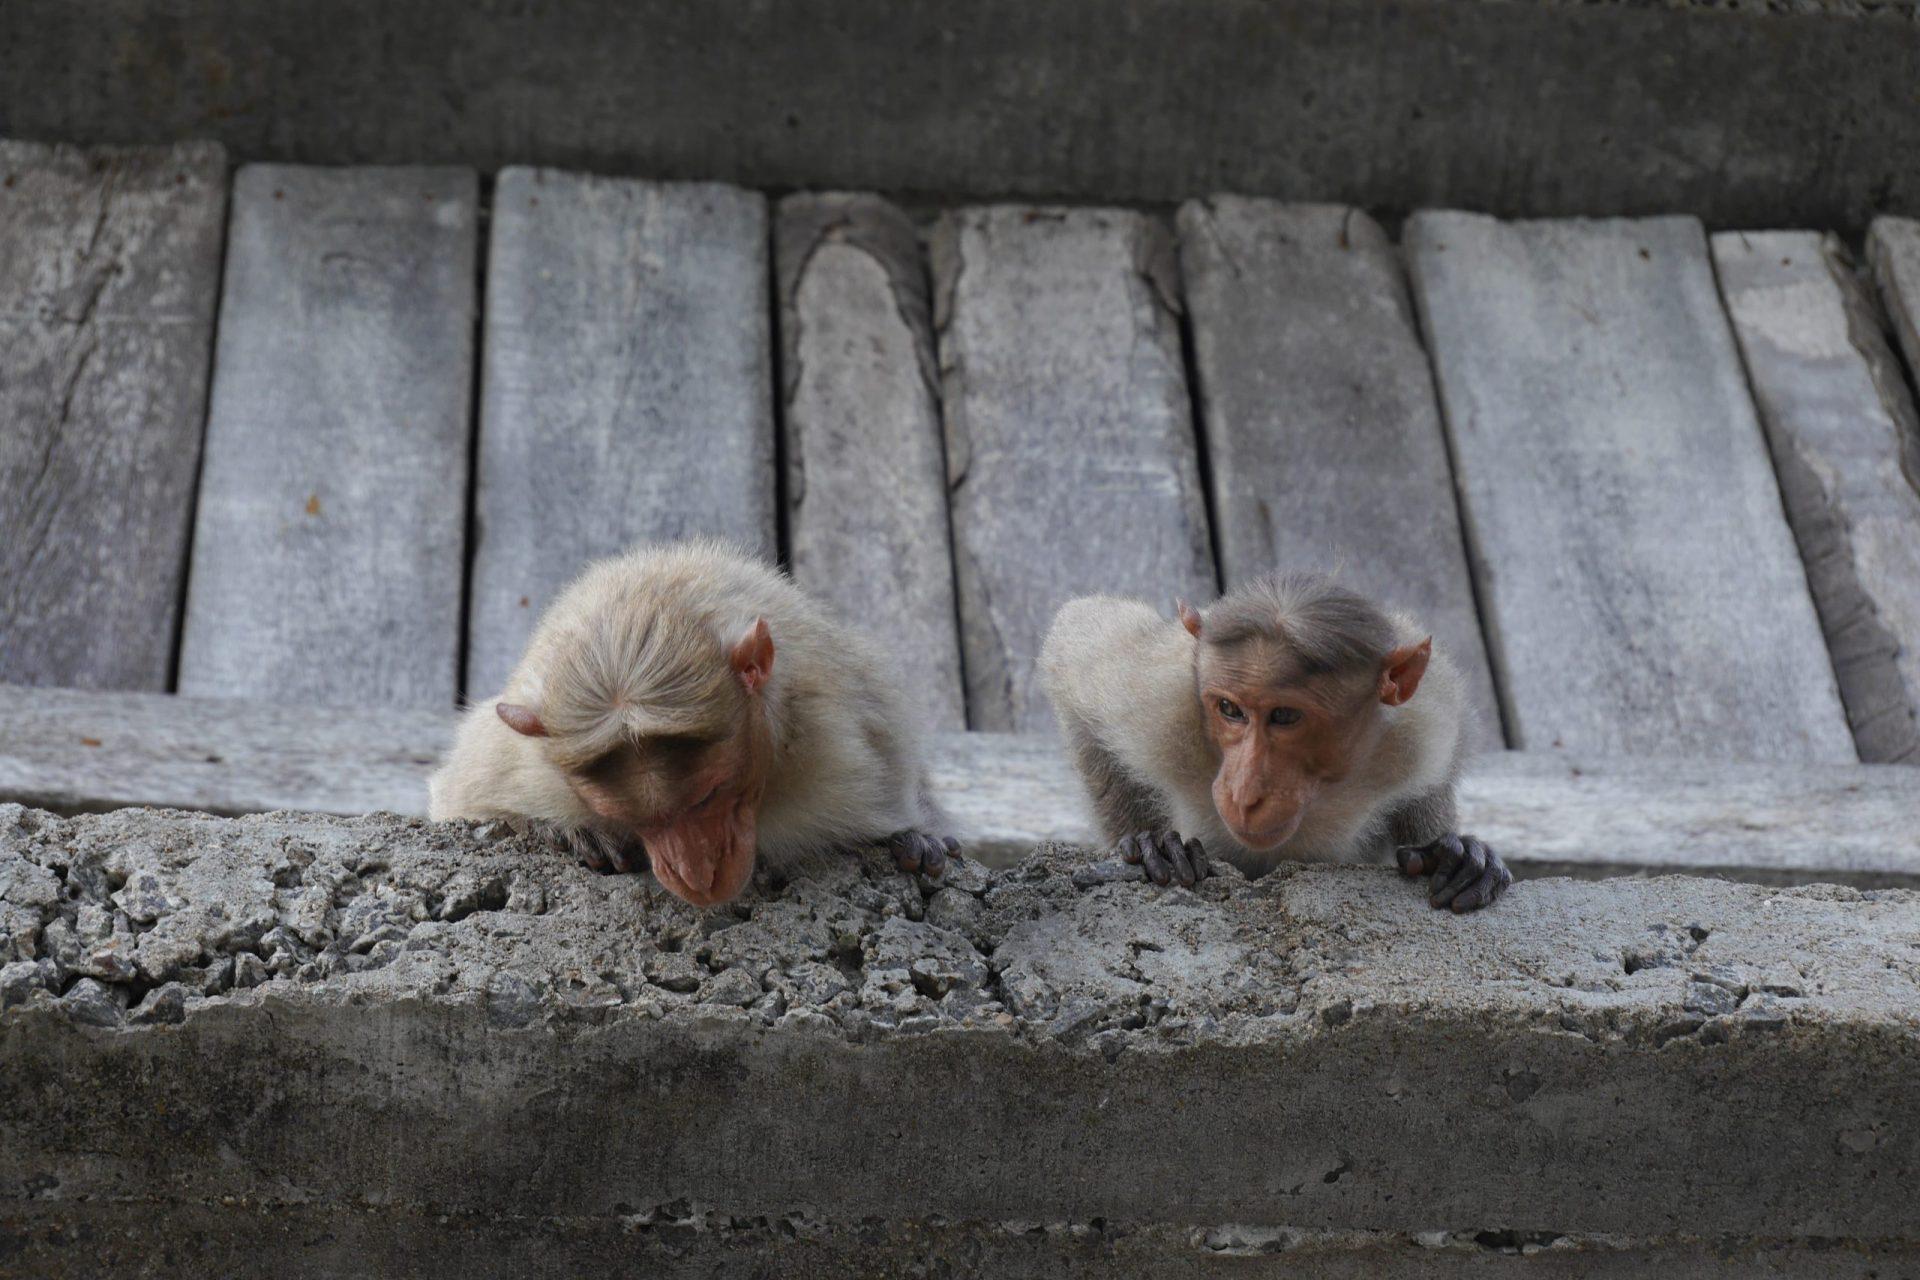 <span class='p-name'>Monkeys Throwing Feces</span>